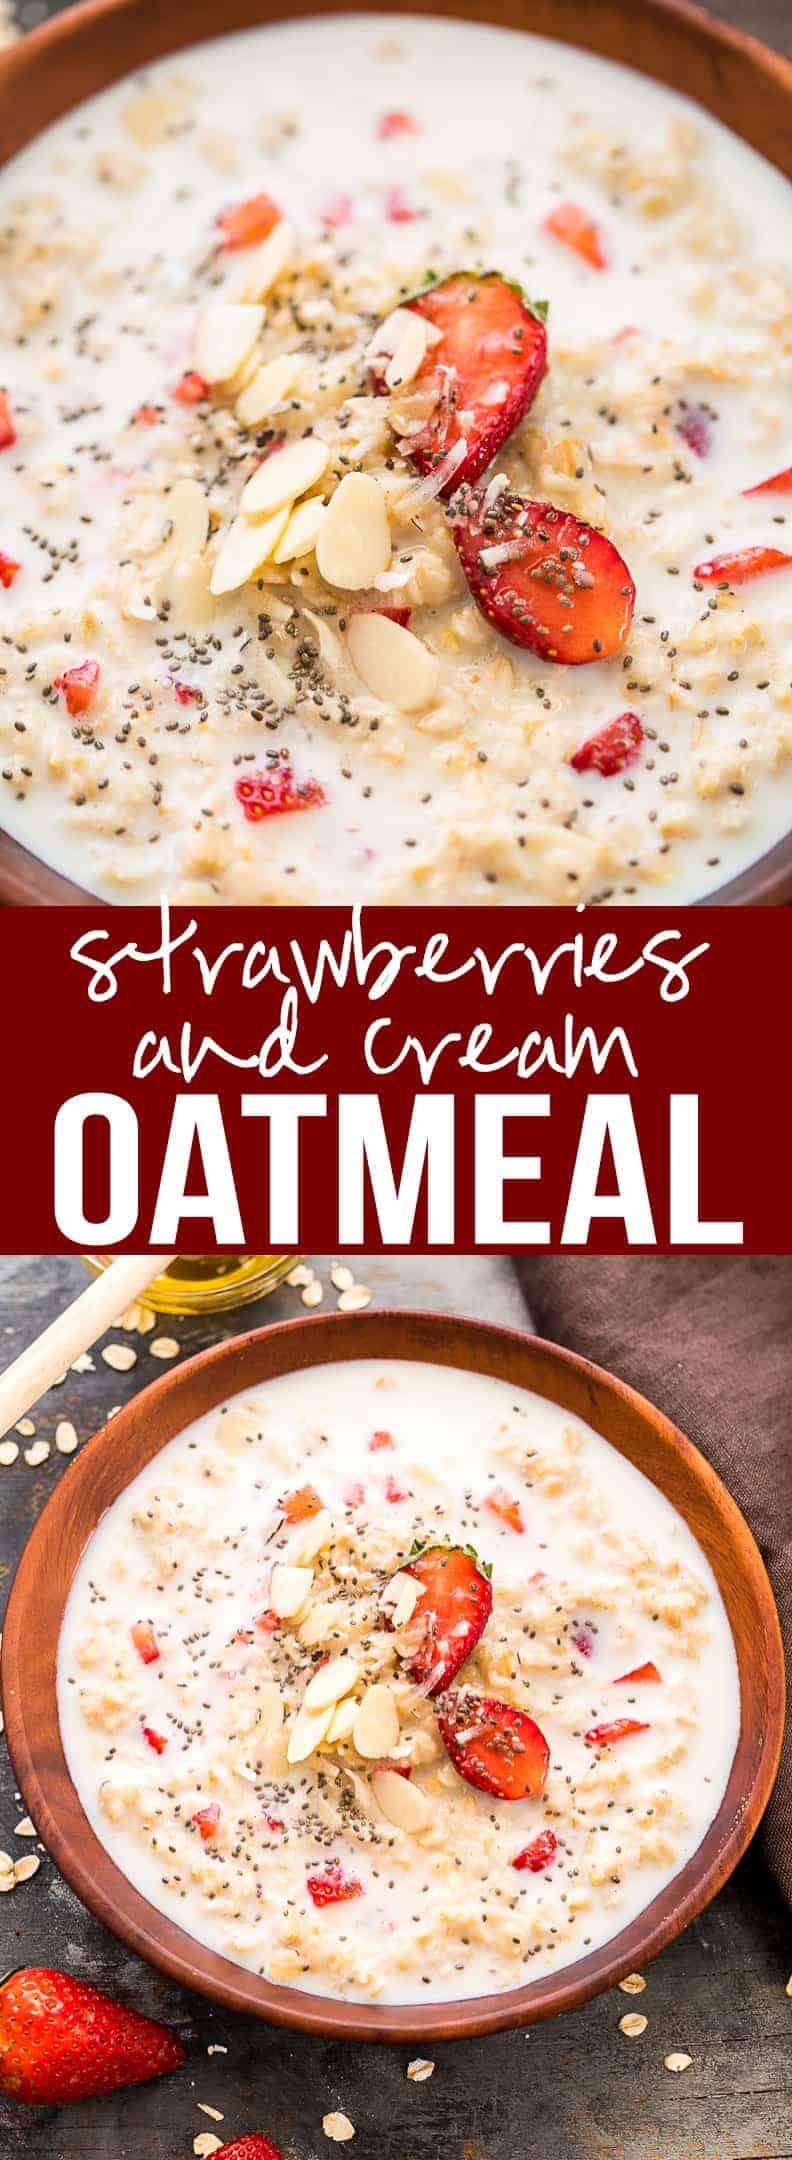 Healthy Strawberries and Cream Breakfast Oatmeal